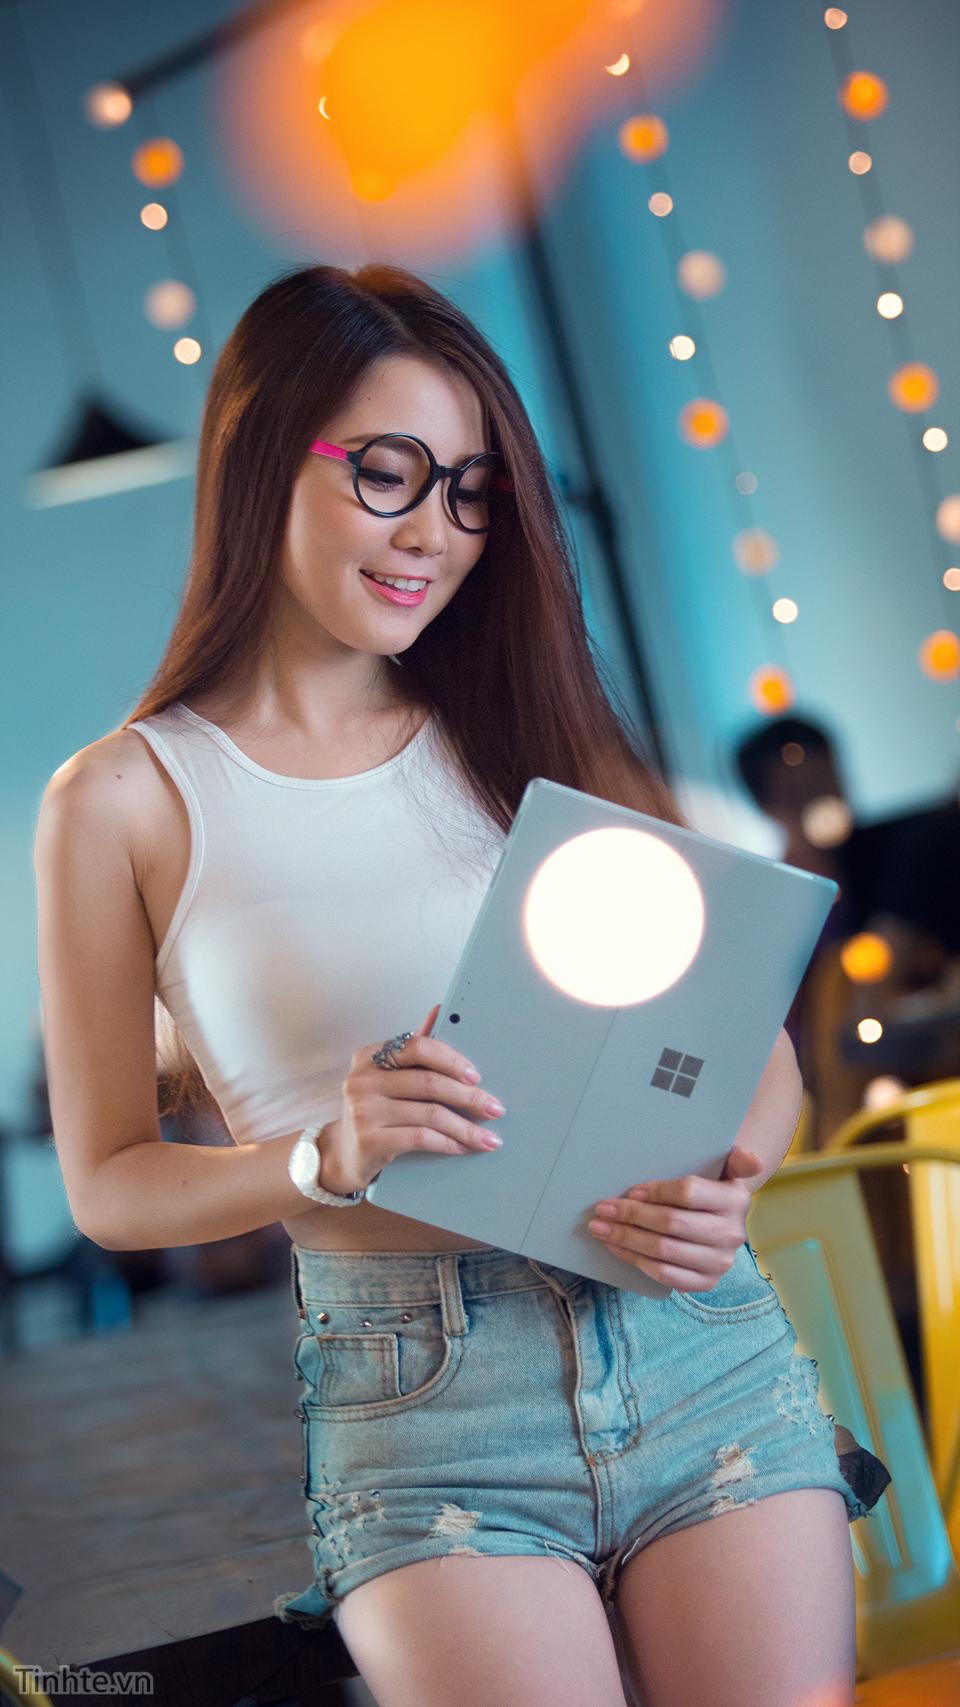 Surface_Pro_4_Nguoi_dep_cong_nghe_tinhte-12.jpg